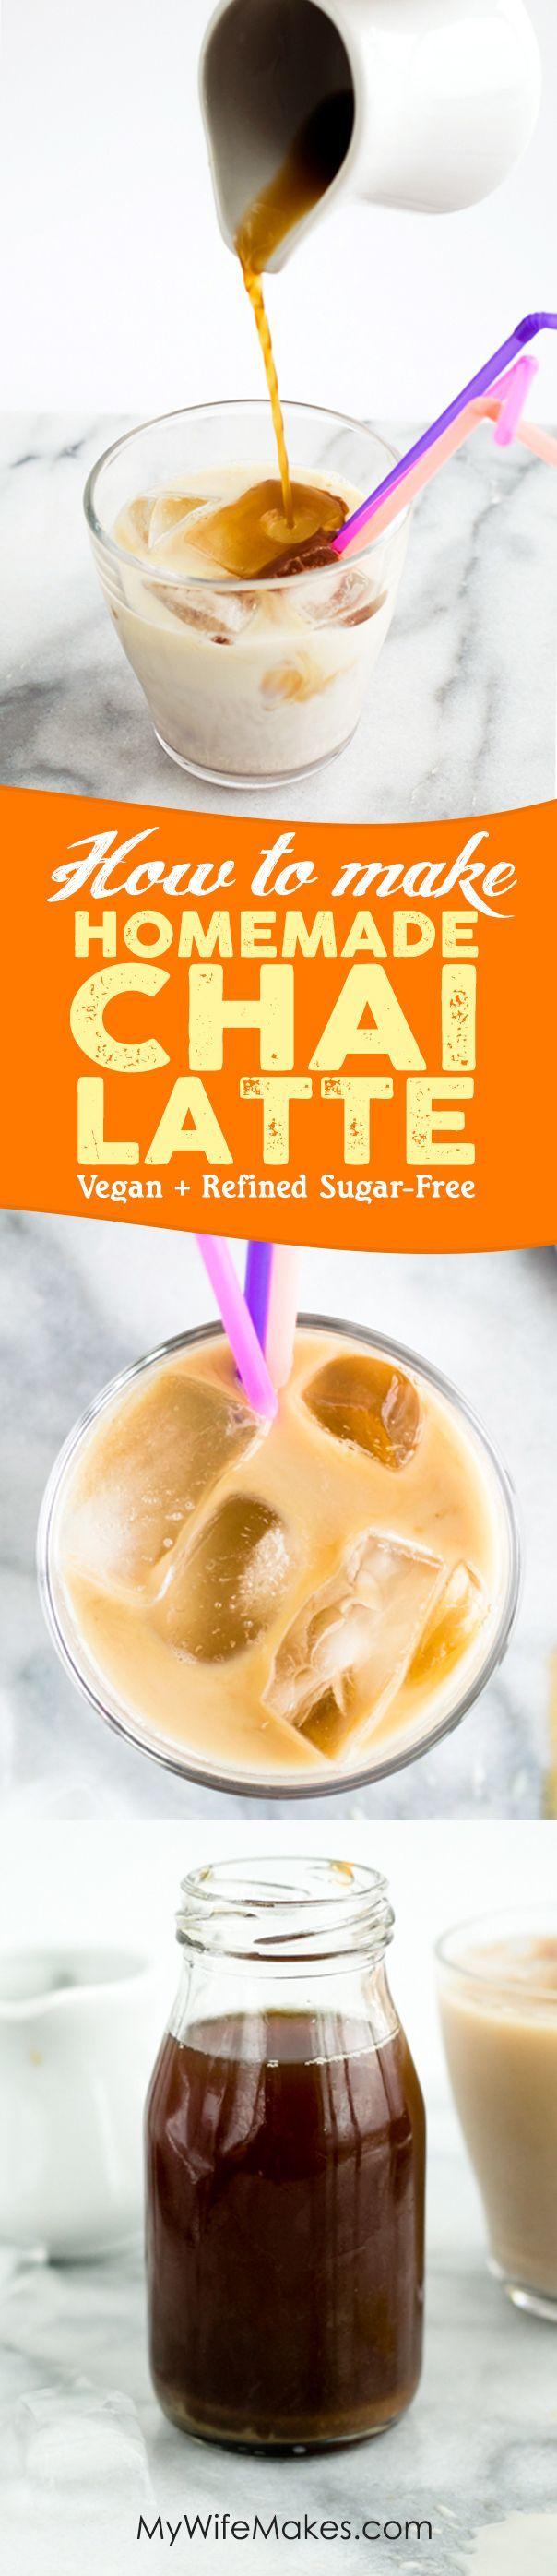 How To Make Chai Tea Latte from Scratch | Recipe